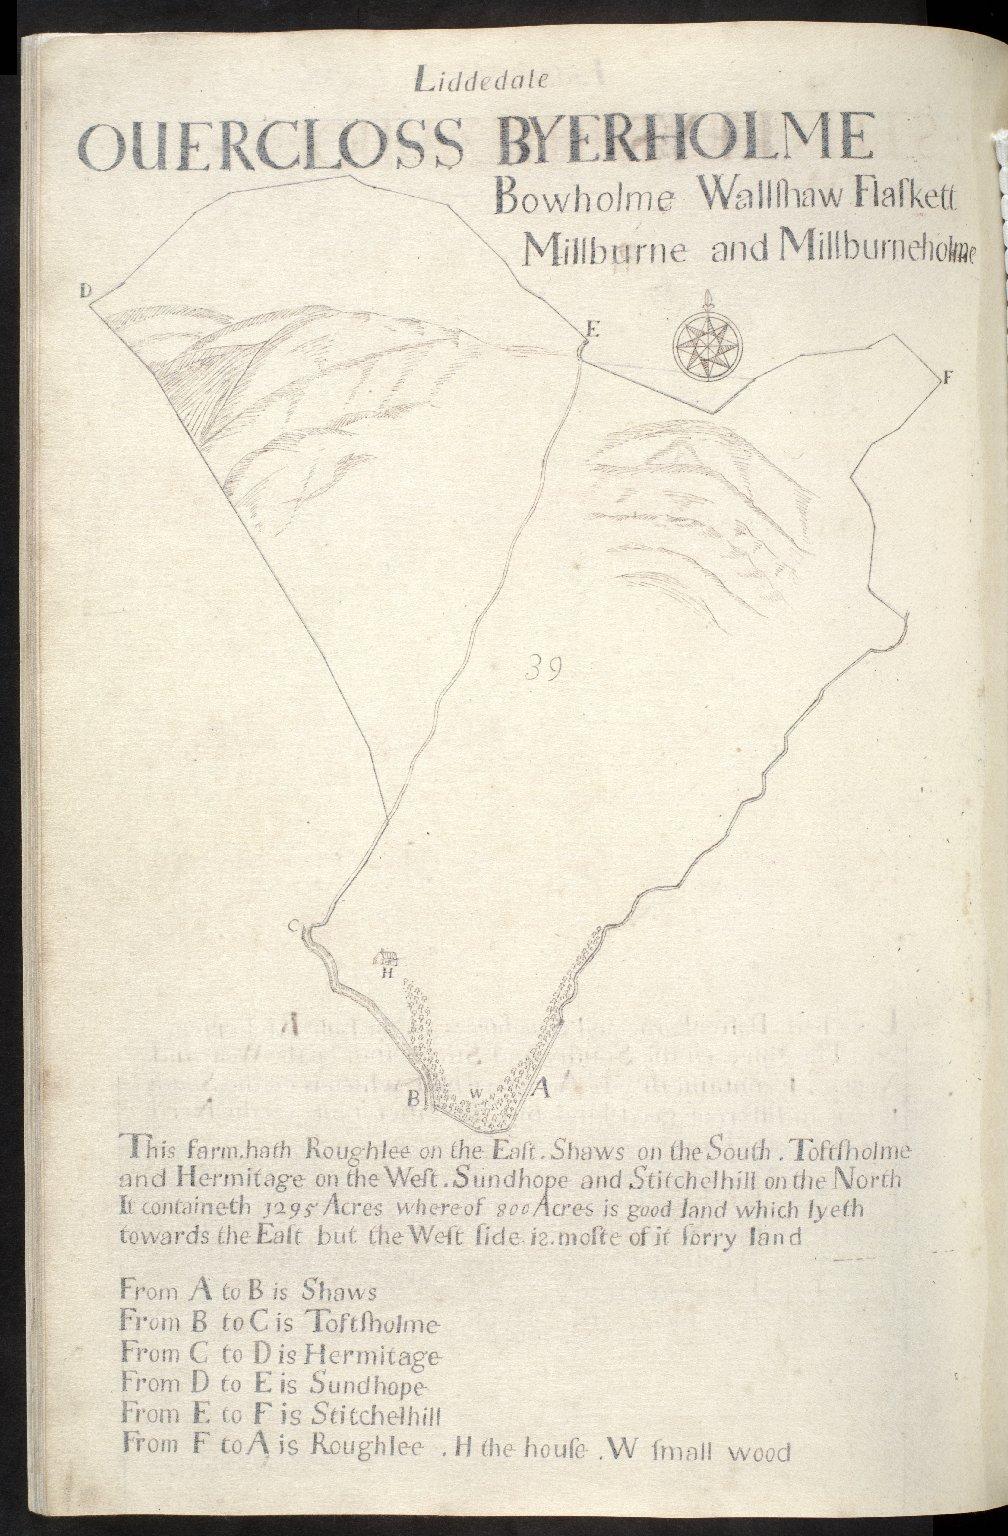 Liddesdale : Ouercloss, Byerholme, [1 of 1]